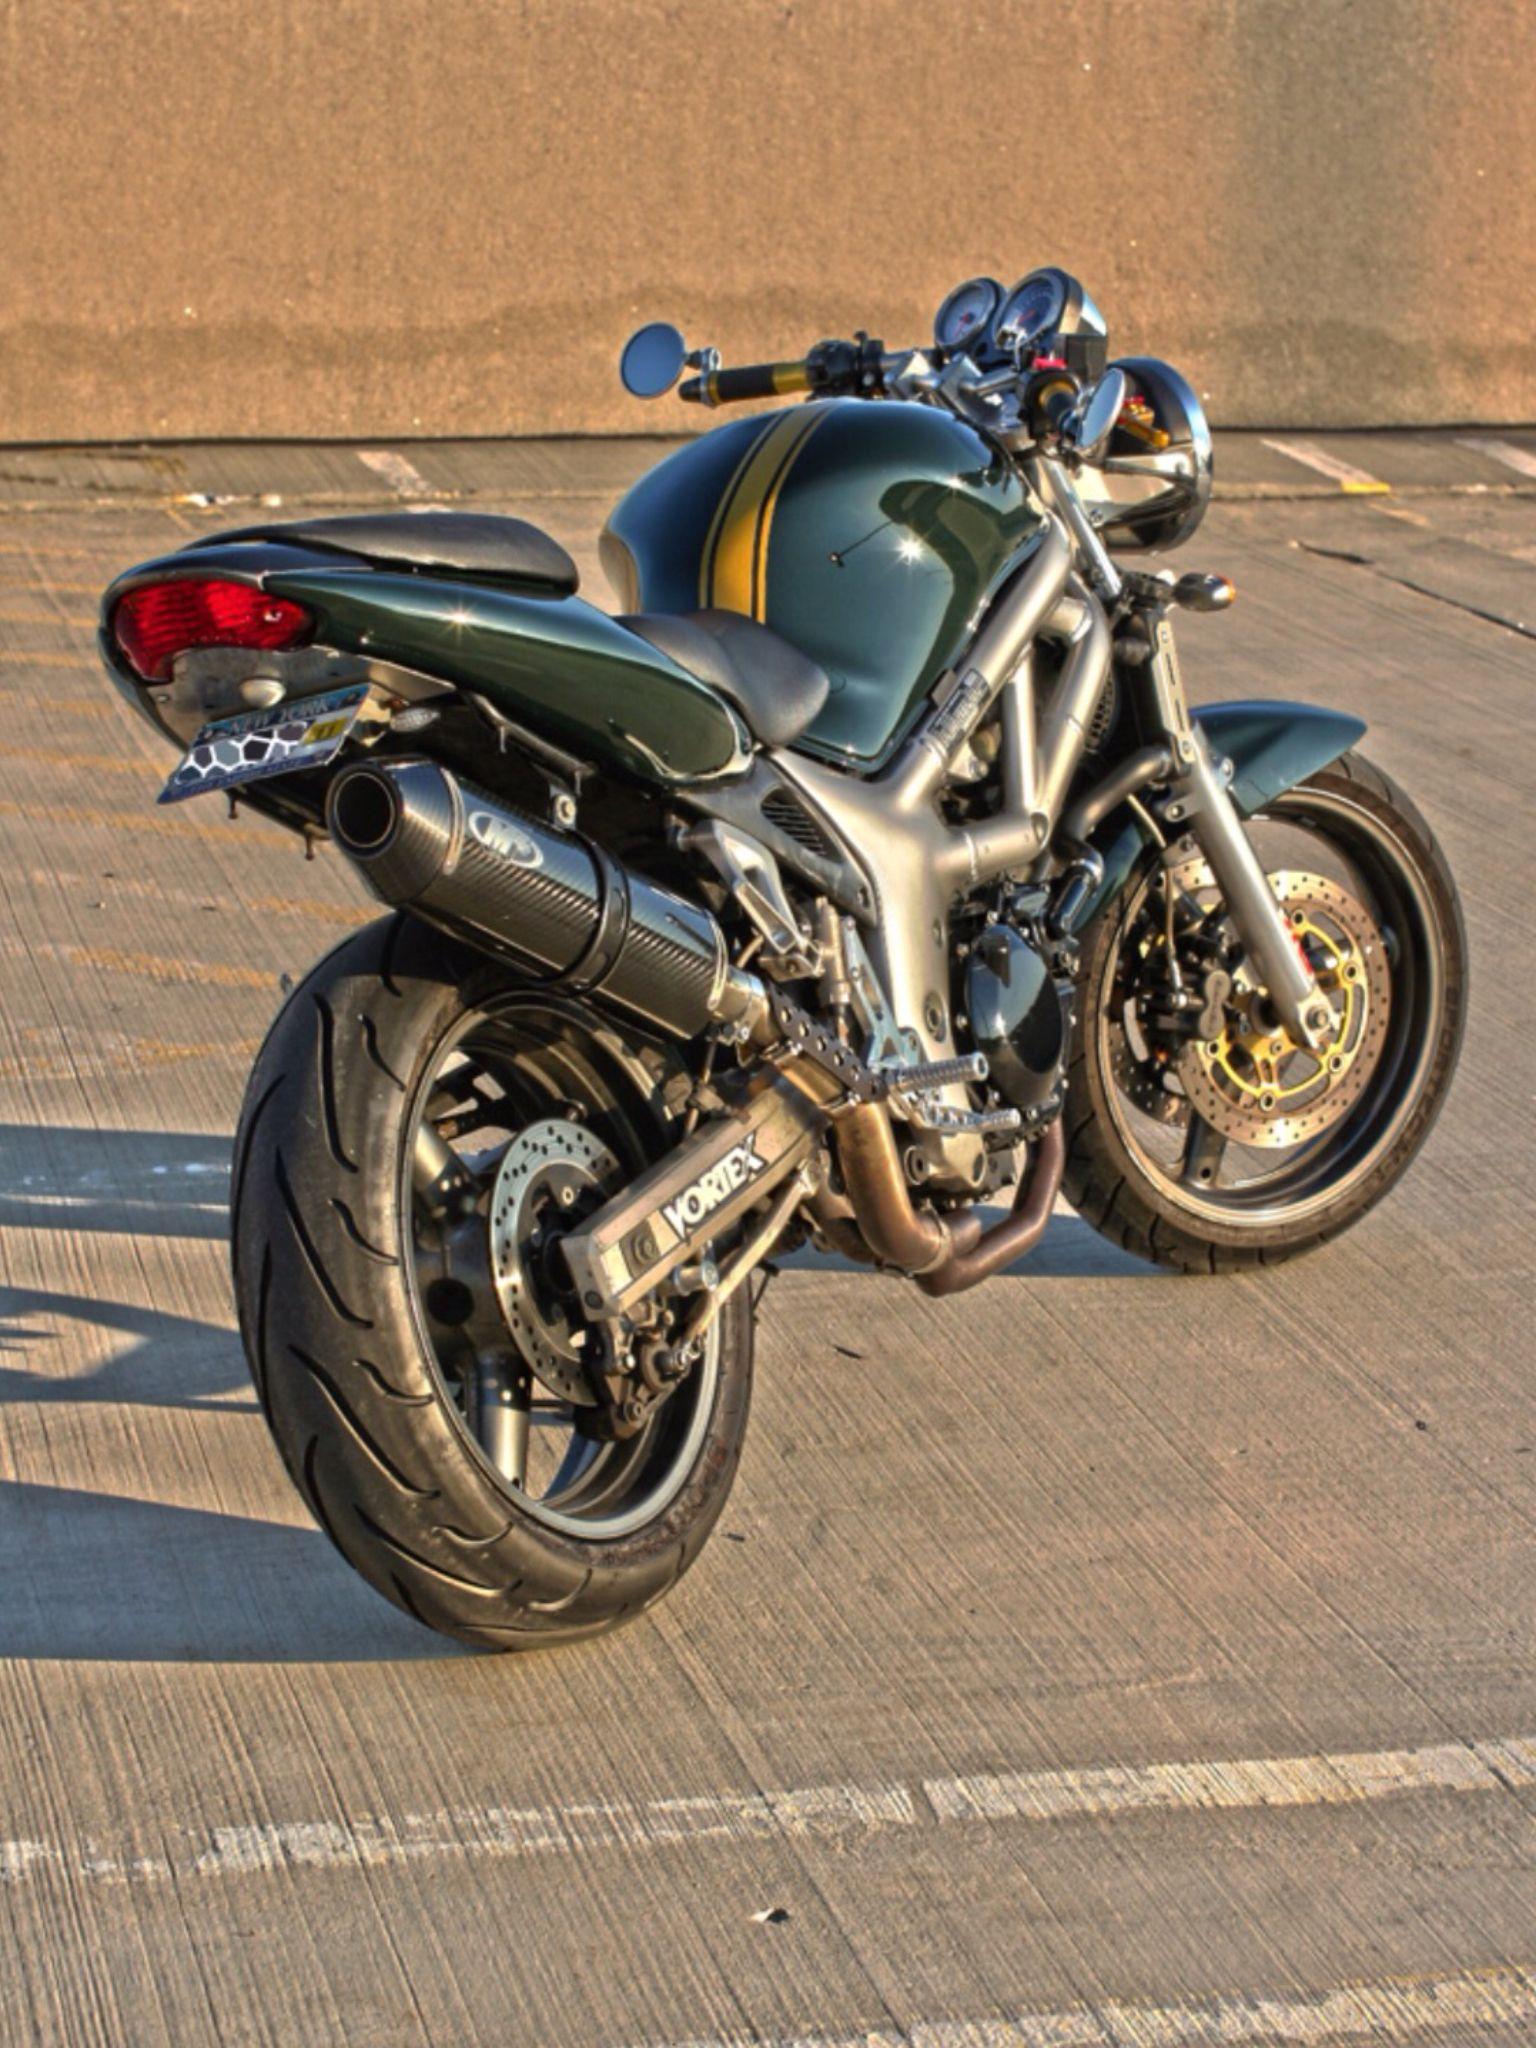 Suzuki sv 650 scrumbler   Retro bike, Motorbikes, Suzuki